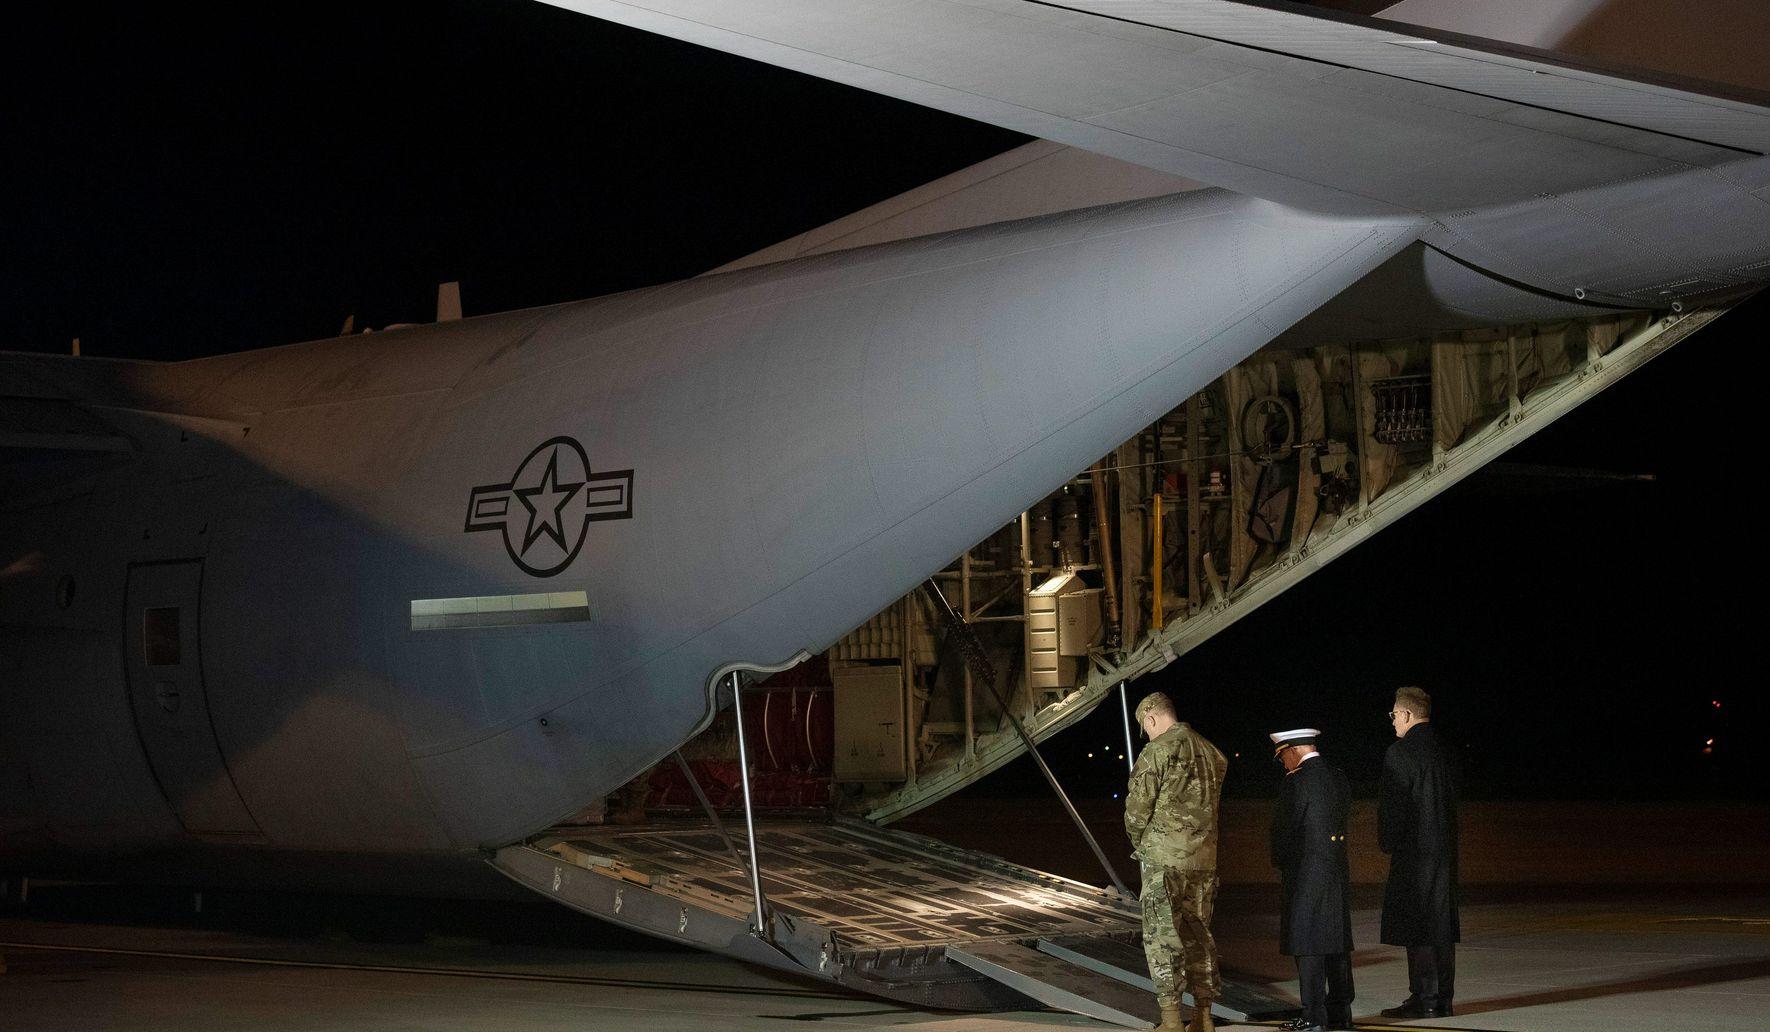 Pentagon halts operation training with Saudi Arabia